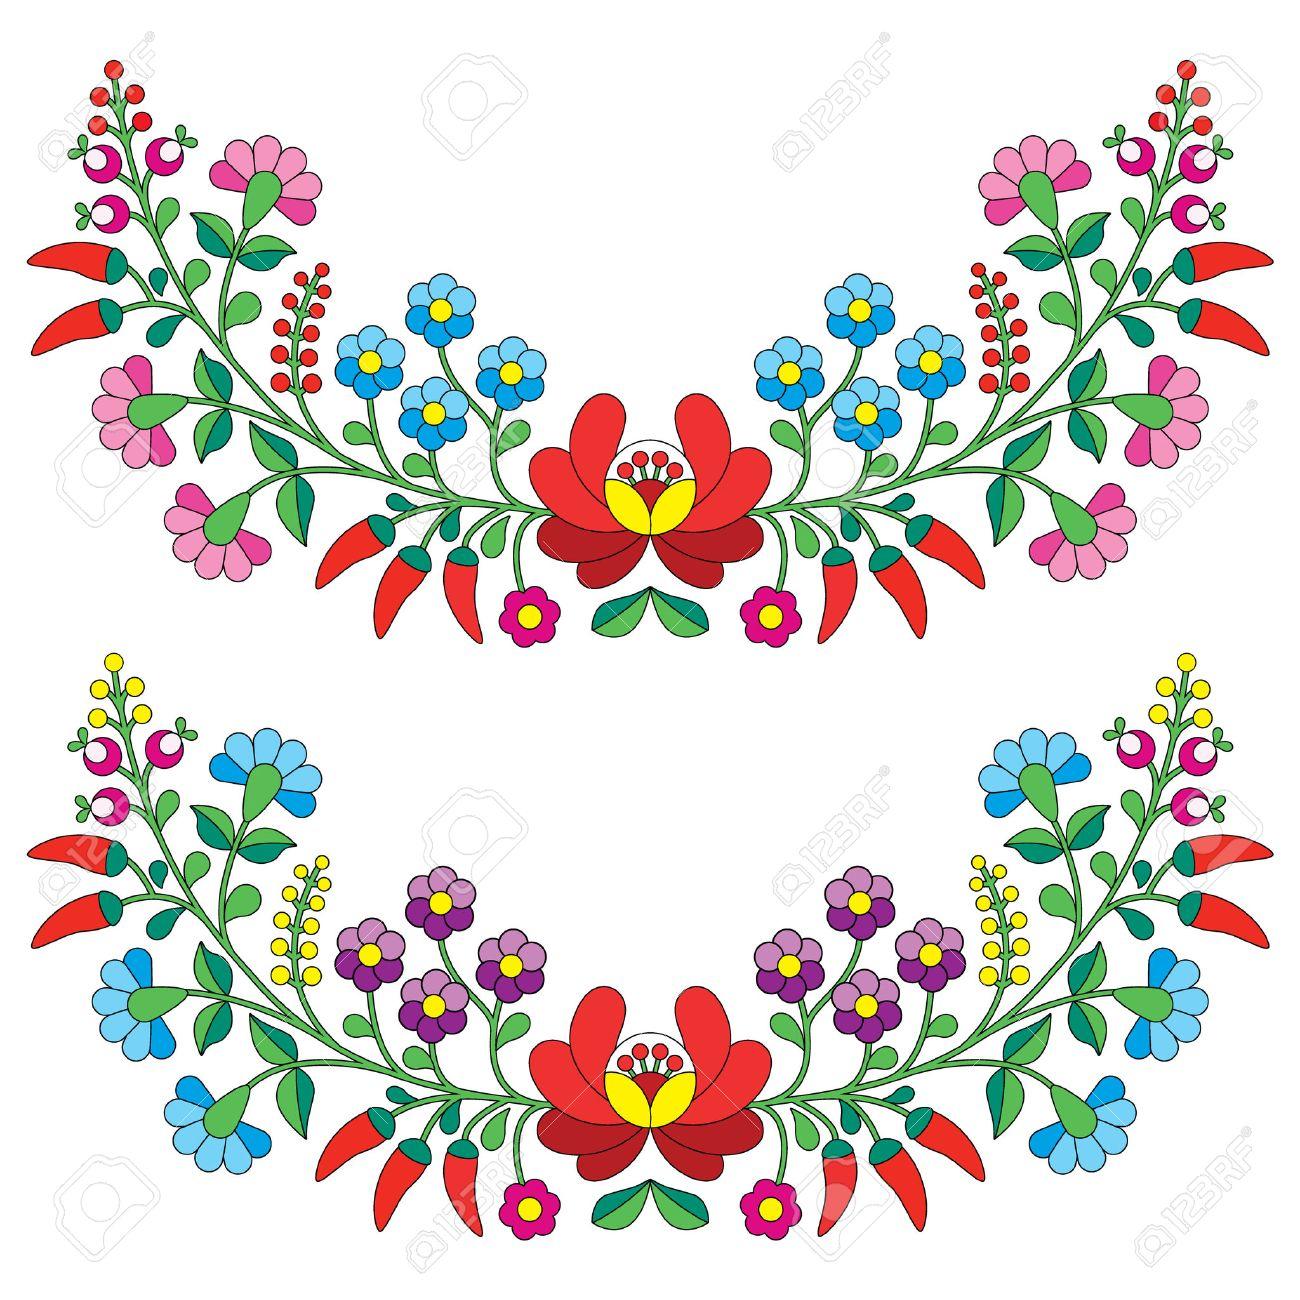 Folk Patrón Floral Húngaro - Bordado Kalocsai Con Flores Y Pimentón ...